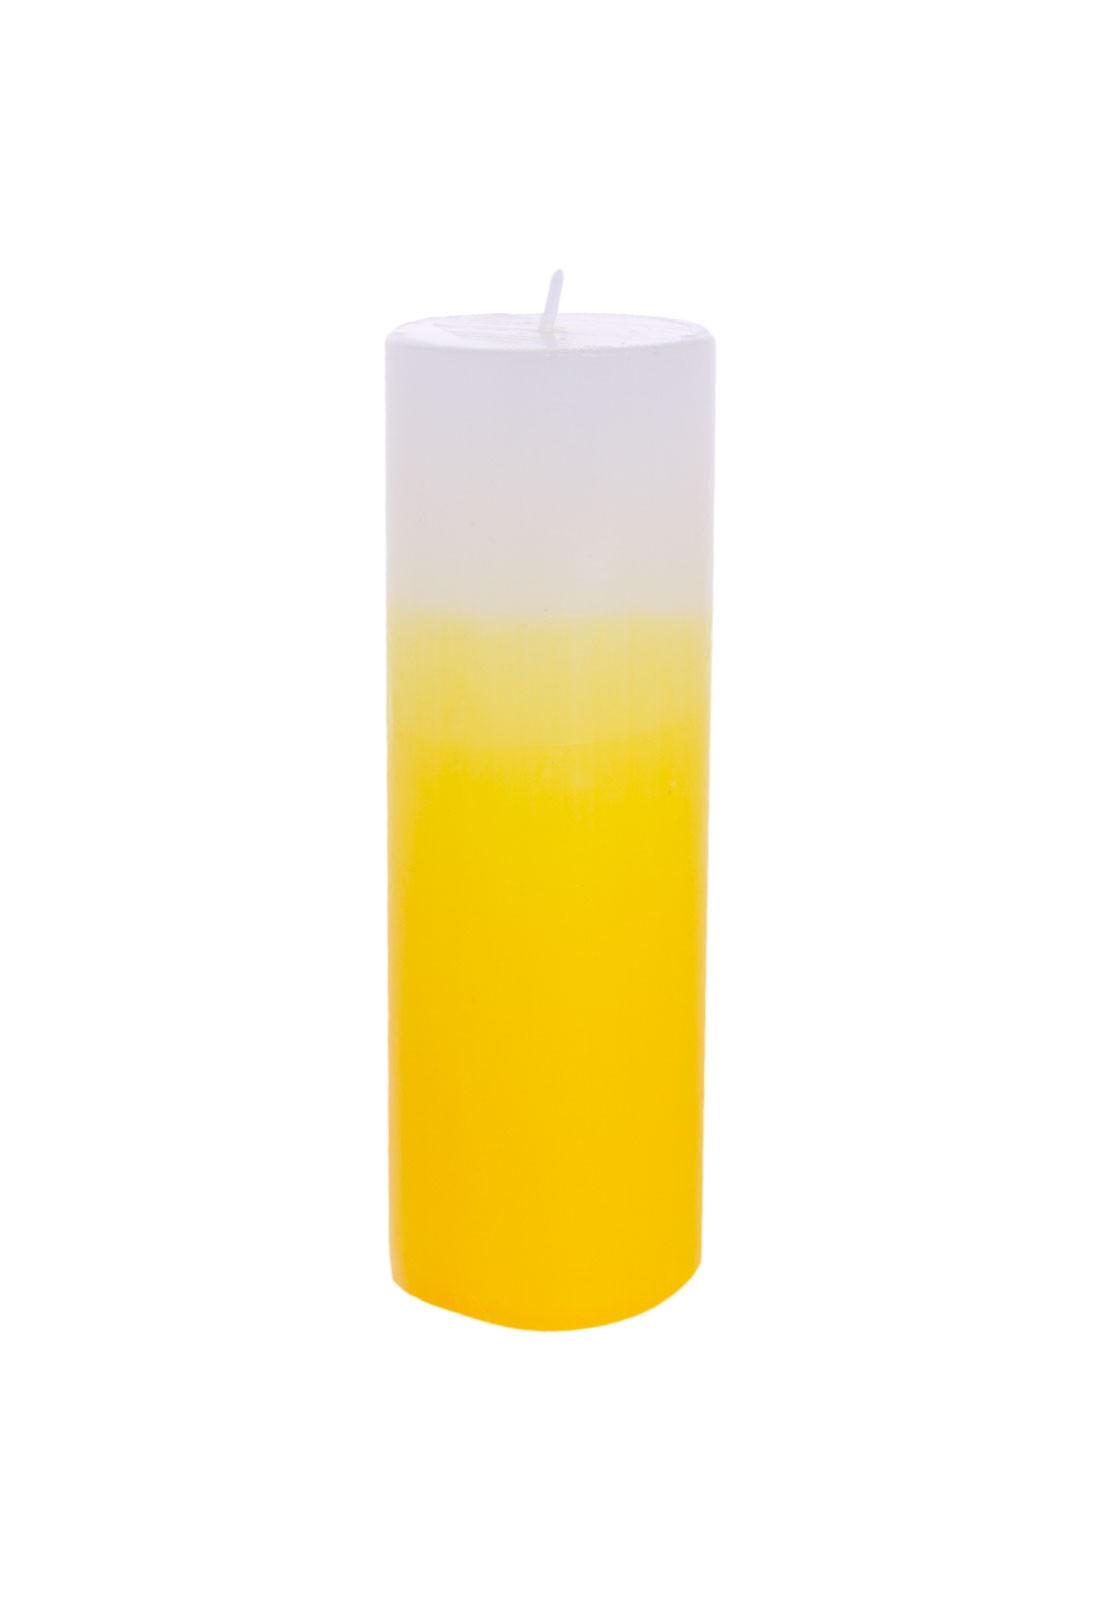 vela cilindro 6×14 branca degrade amarelo